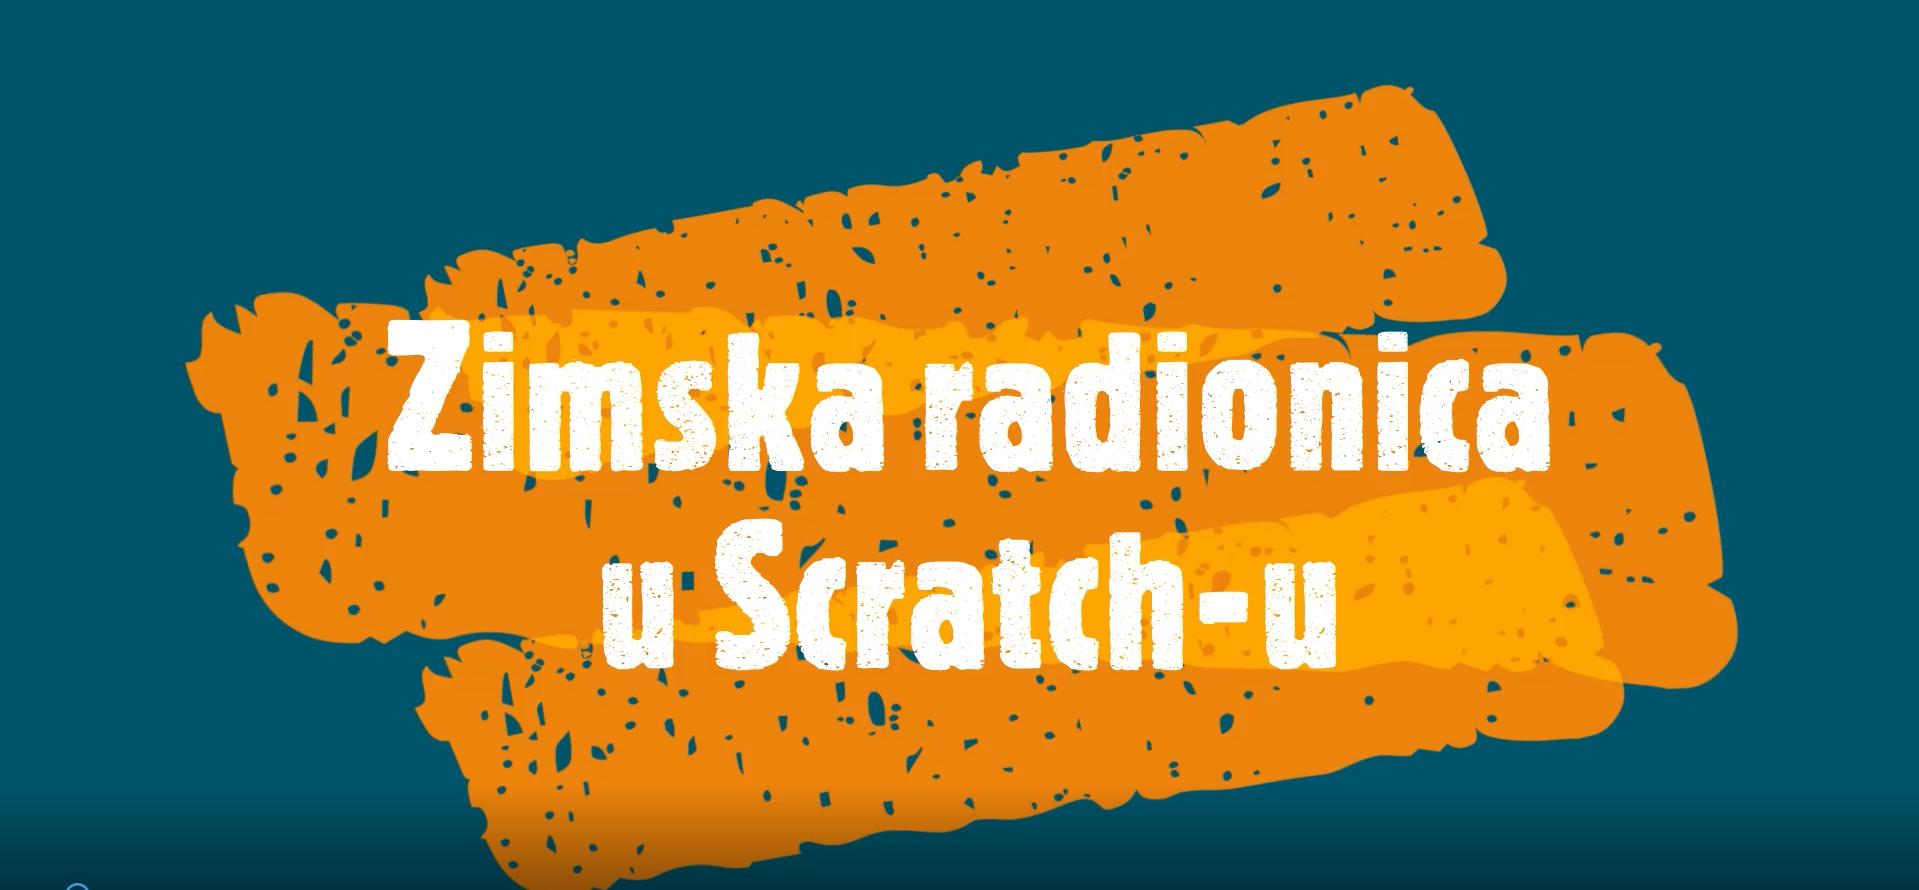 Zimska radionica u Scratch-u